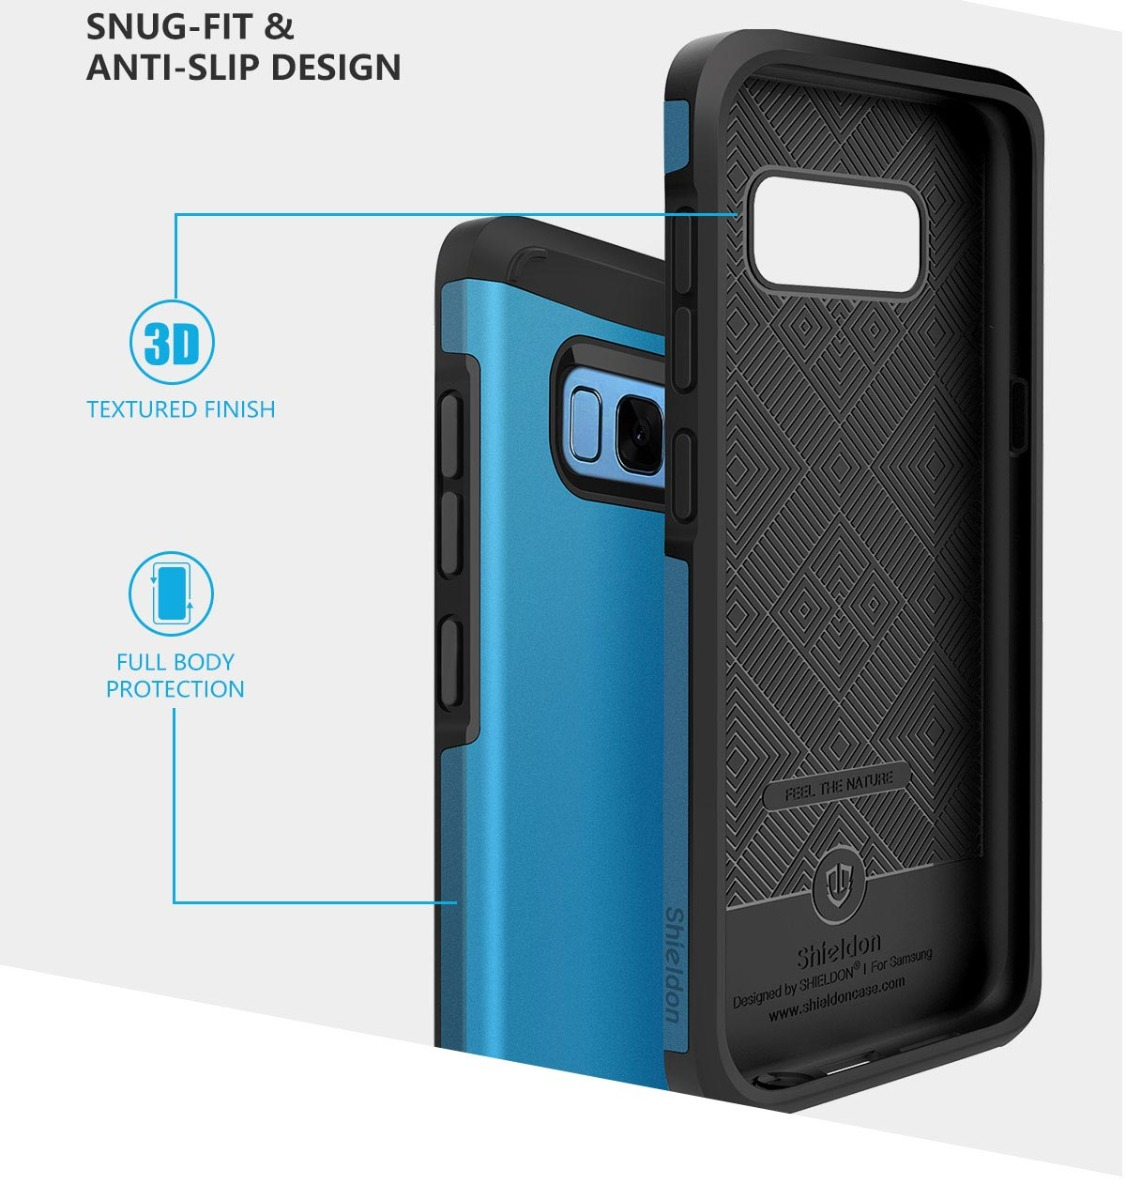 SHIELDON SAMSUNG Galaxy S8 Drop Protection Case - Sunrise Series